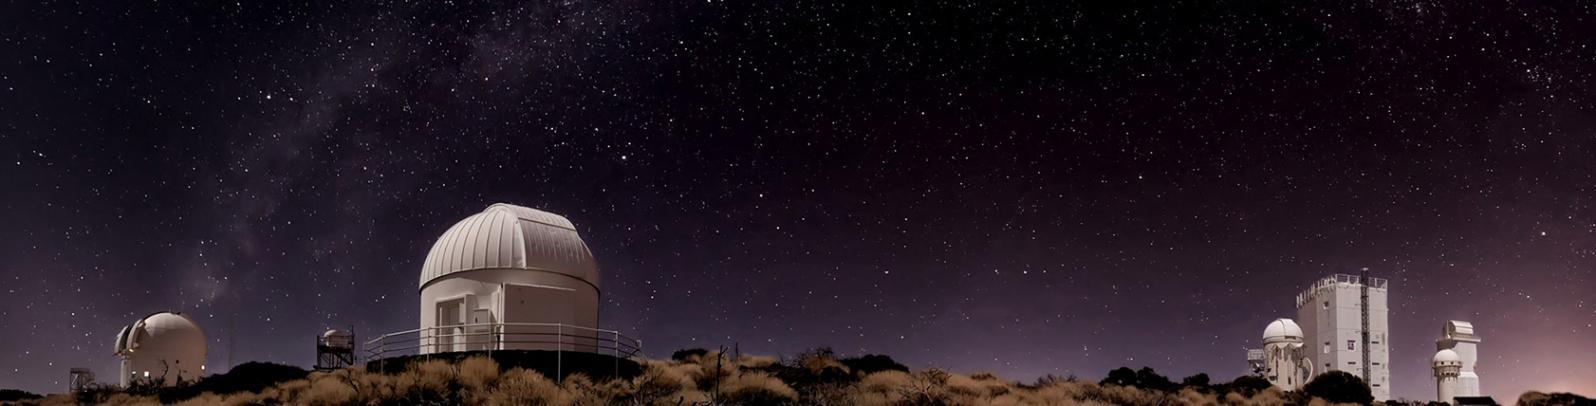 Astroturismo en La Orotava